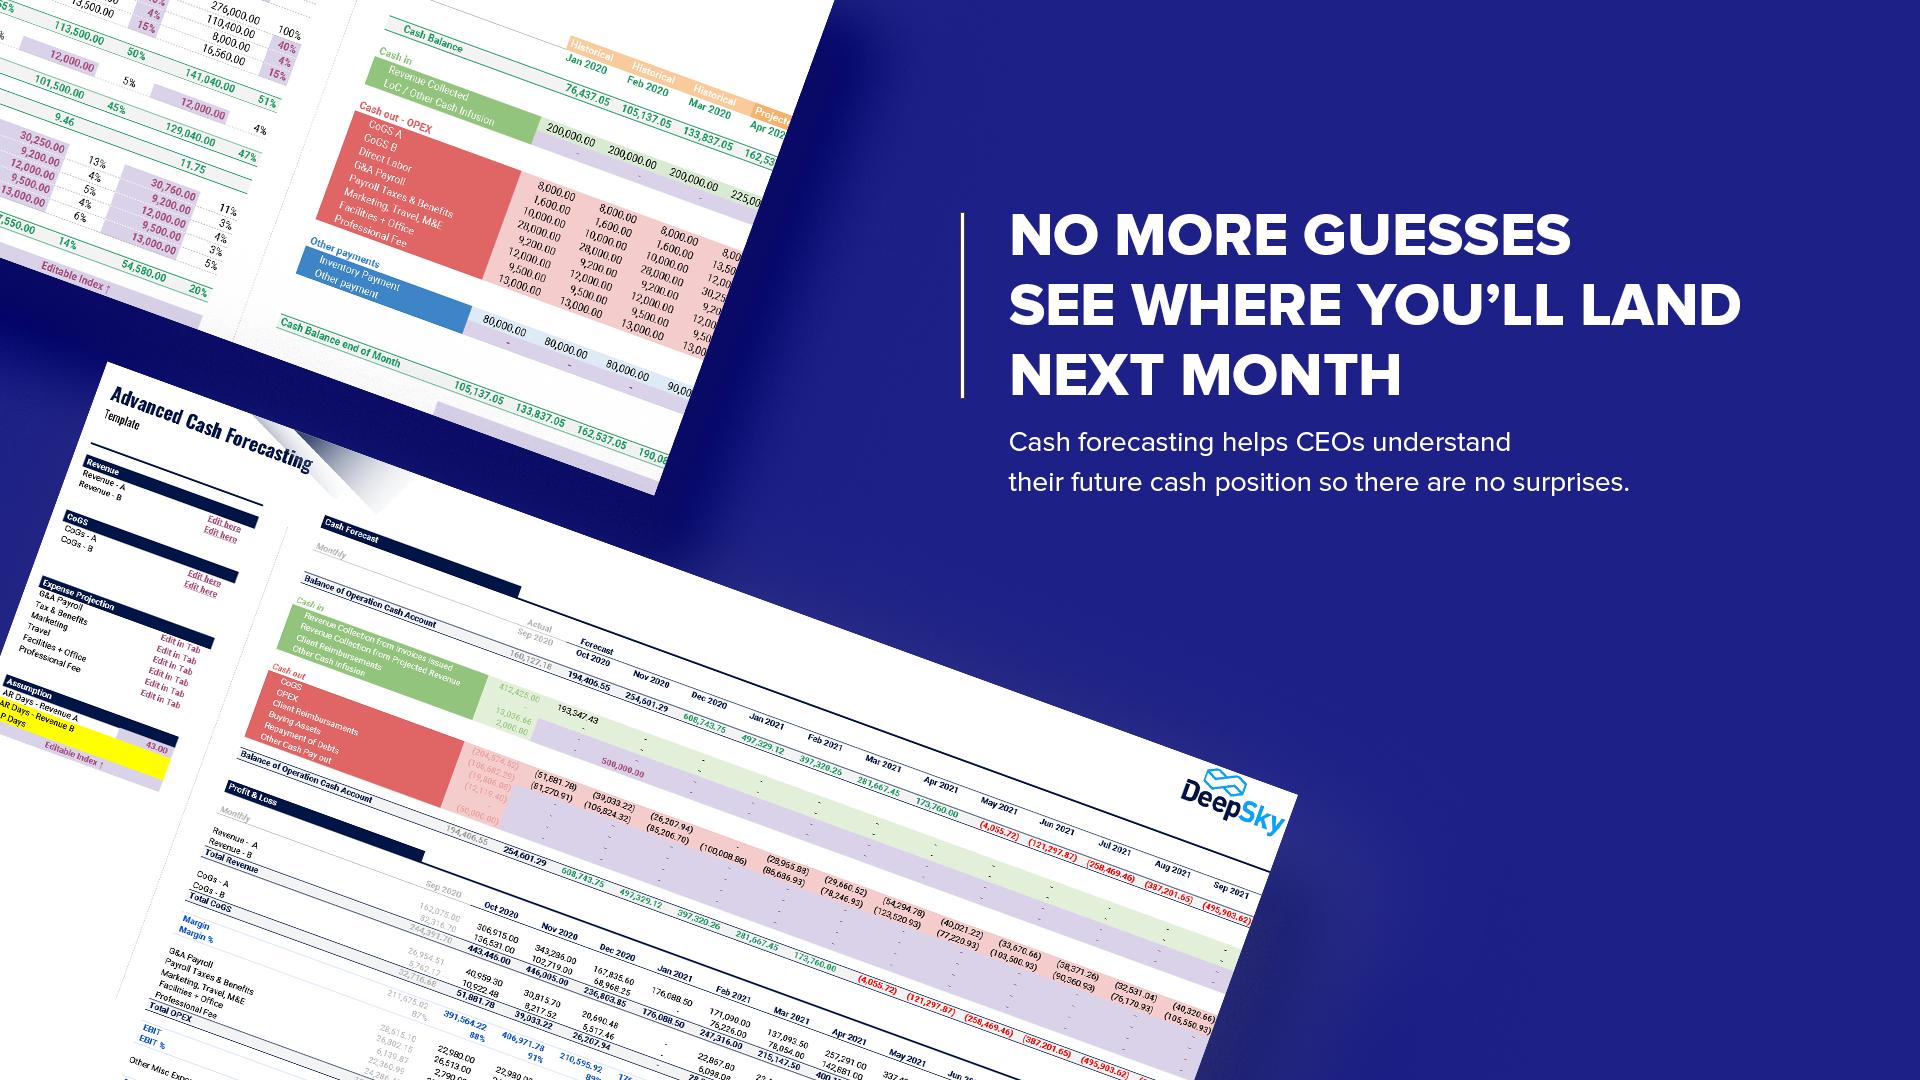 Mockup_Cash Forecasting_promote_1